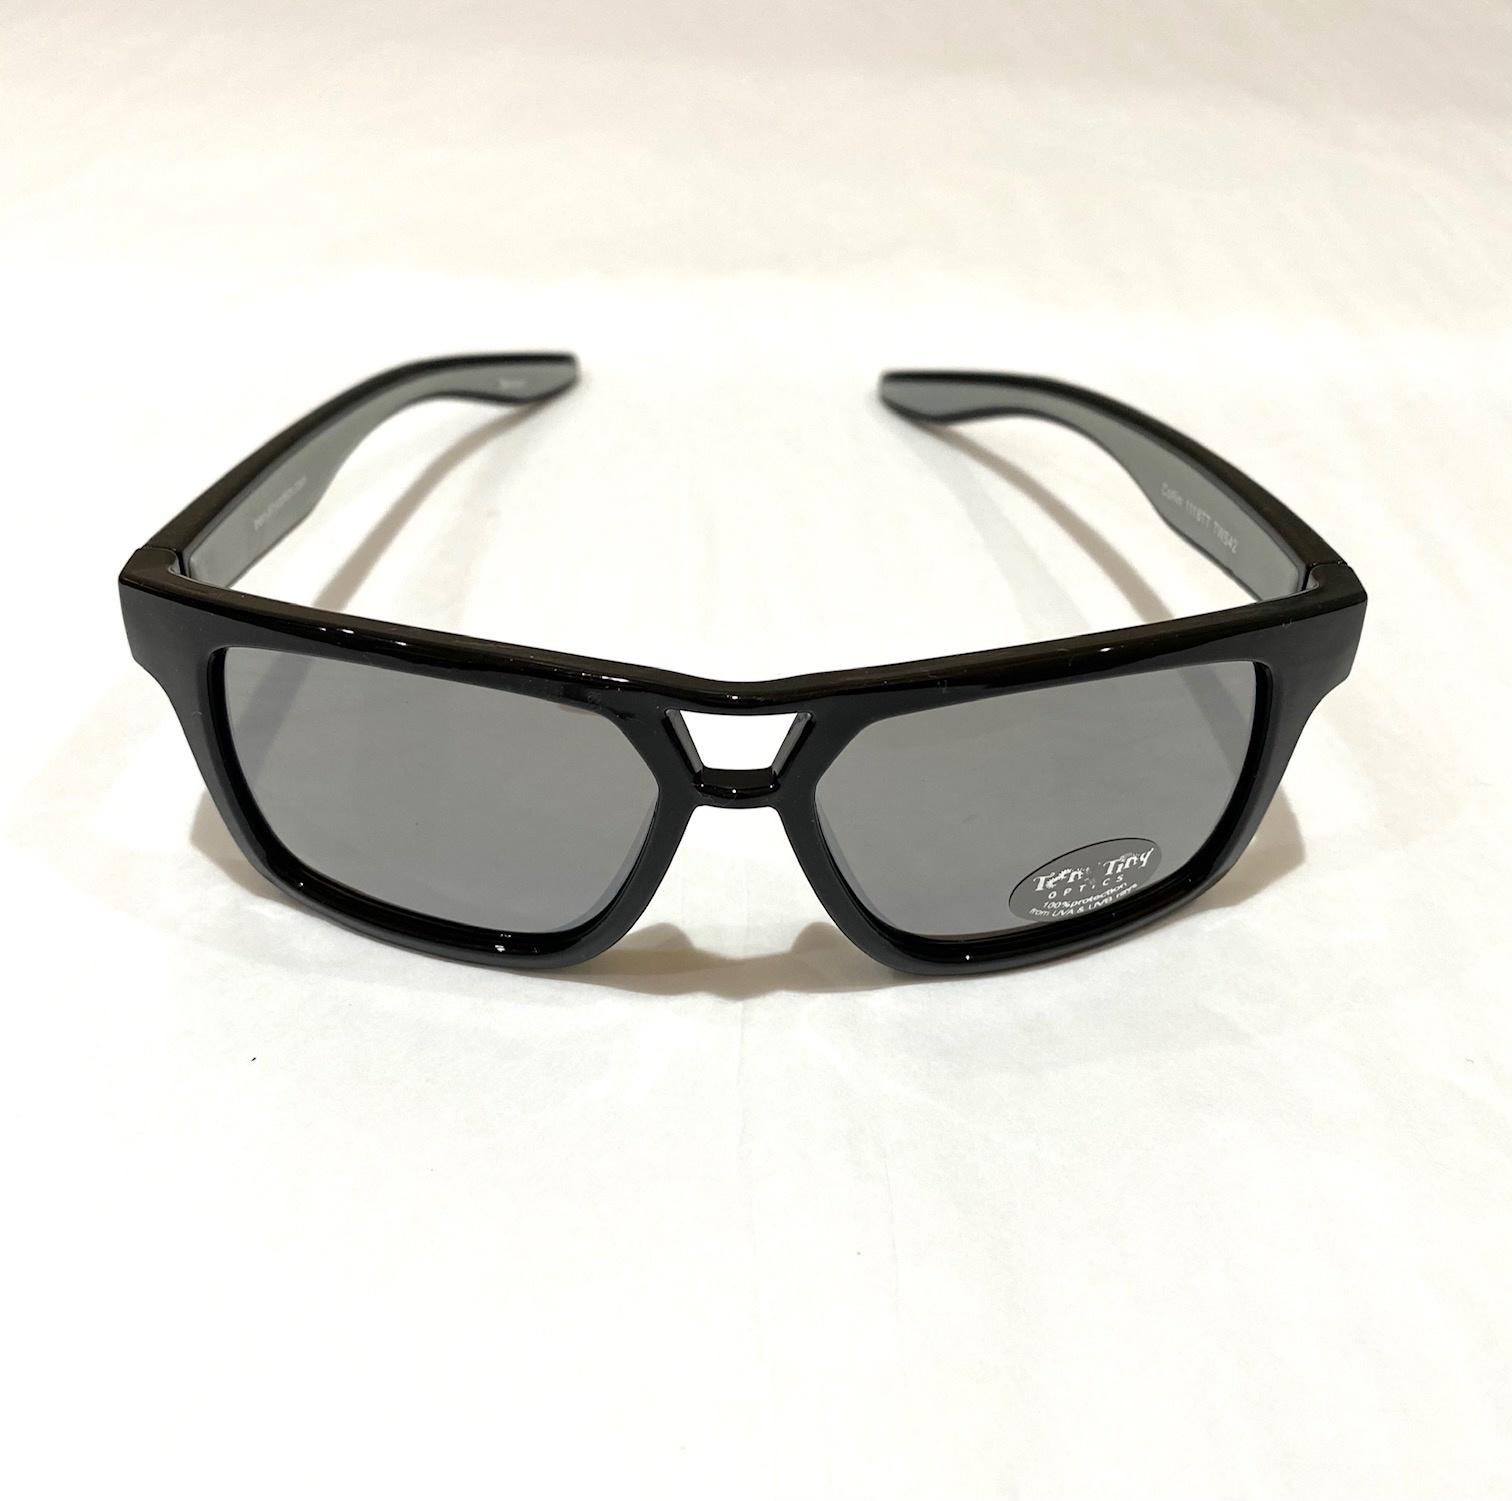 Teeny Tiny Optics Little Kid Sunglasses - Collin MORE COLORS